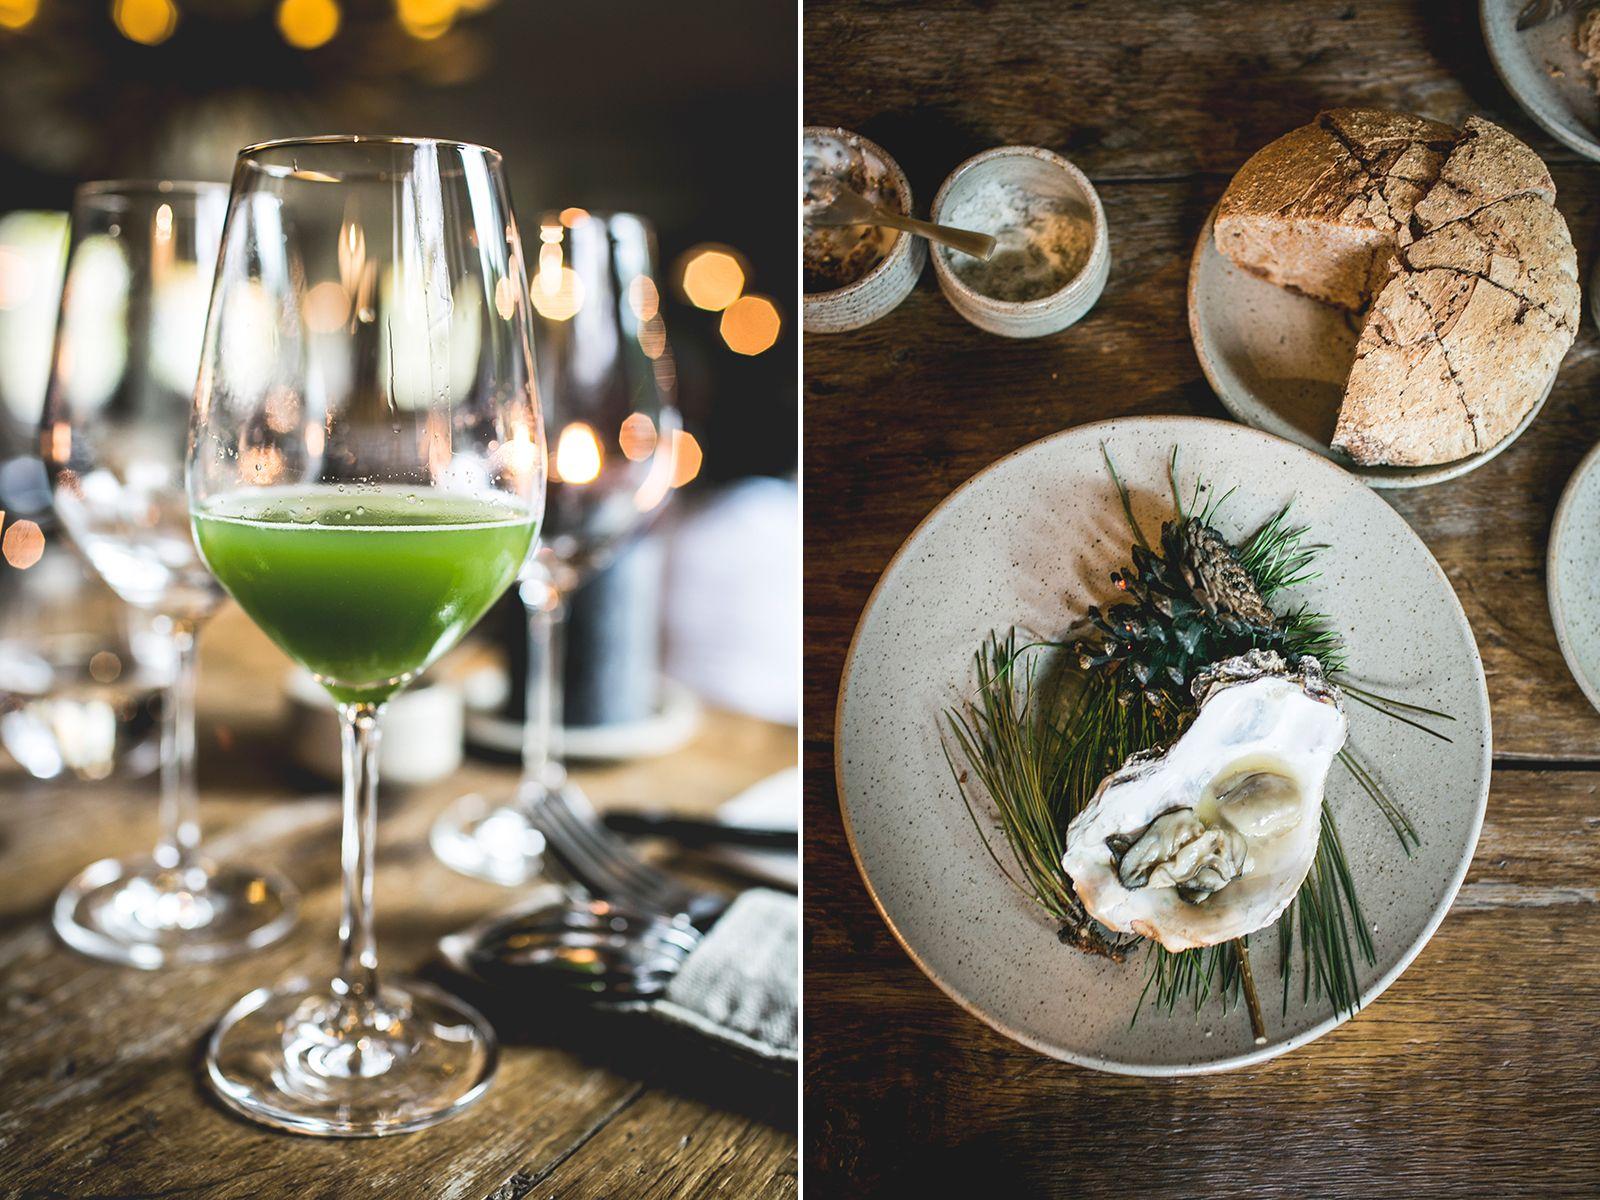 Juice and oyster at restaurant In de Wulf, Belgium | un-folf-ed.com